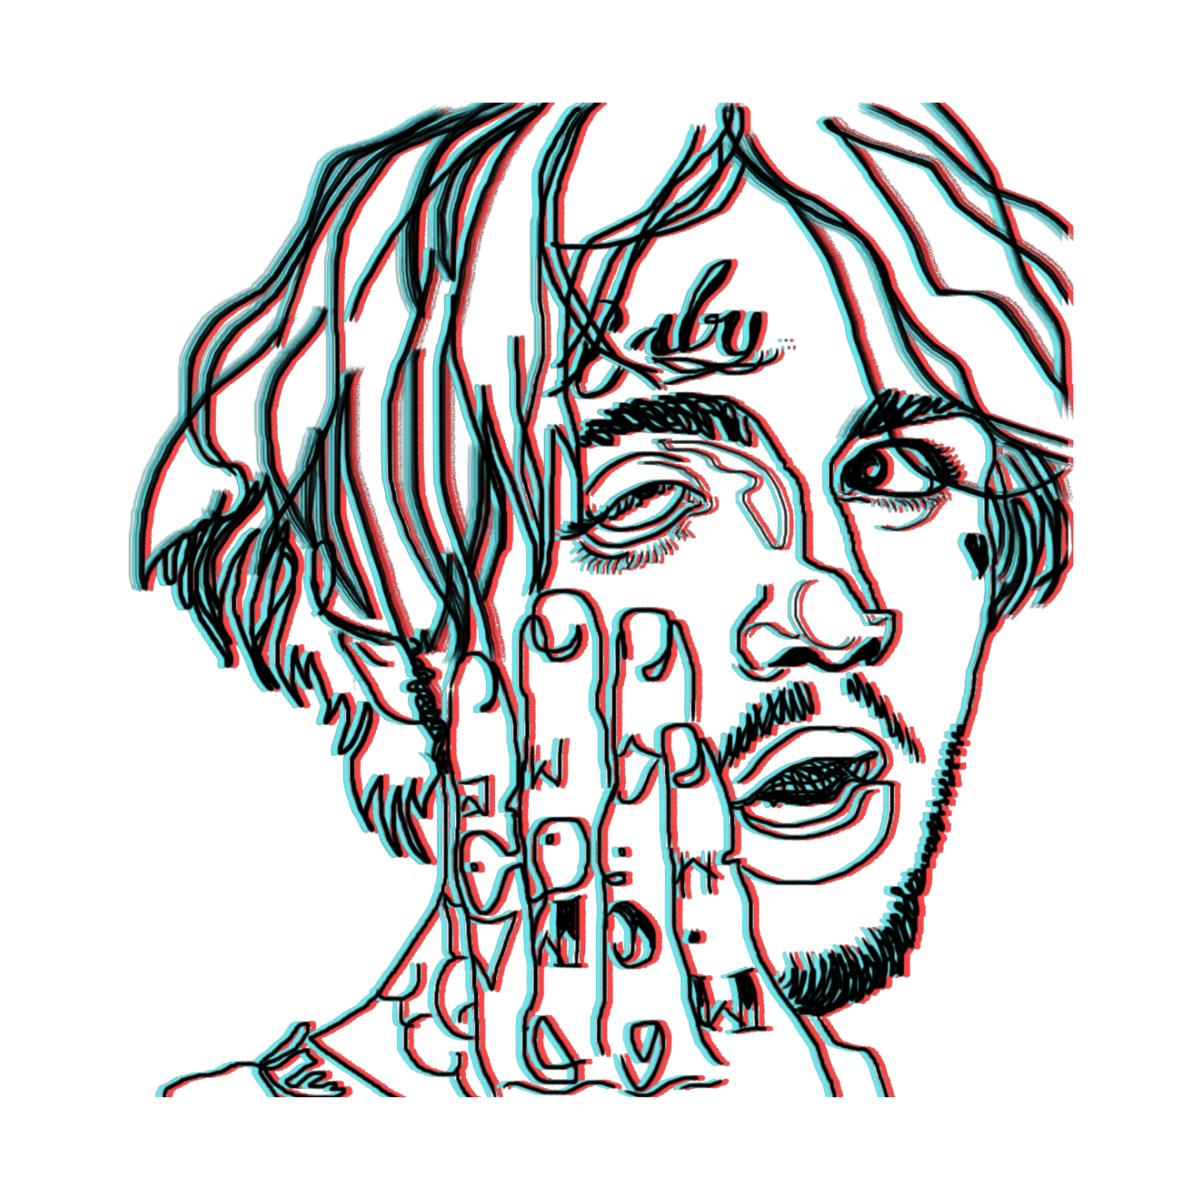 Lil Peep Monimiau16activity S Artist Shop In 2021 Rapper Art Trippy Painting Lil Peep Hellboy